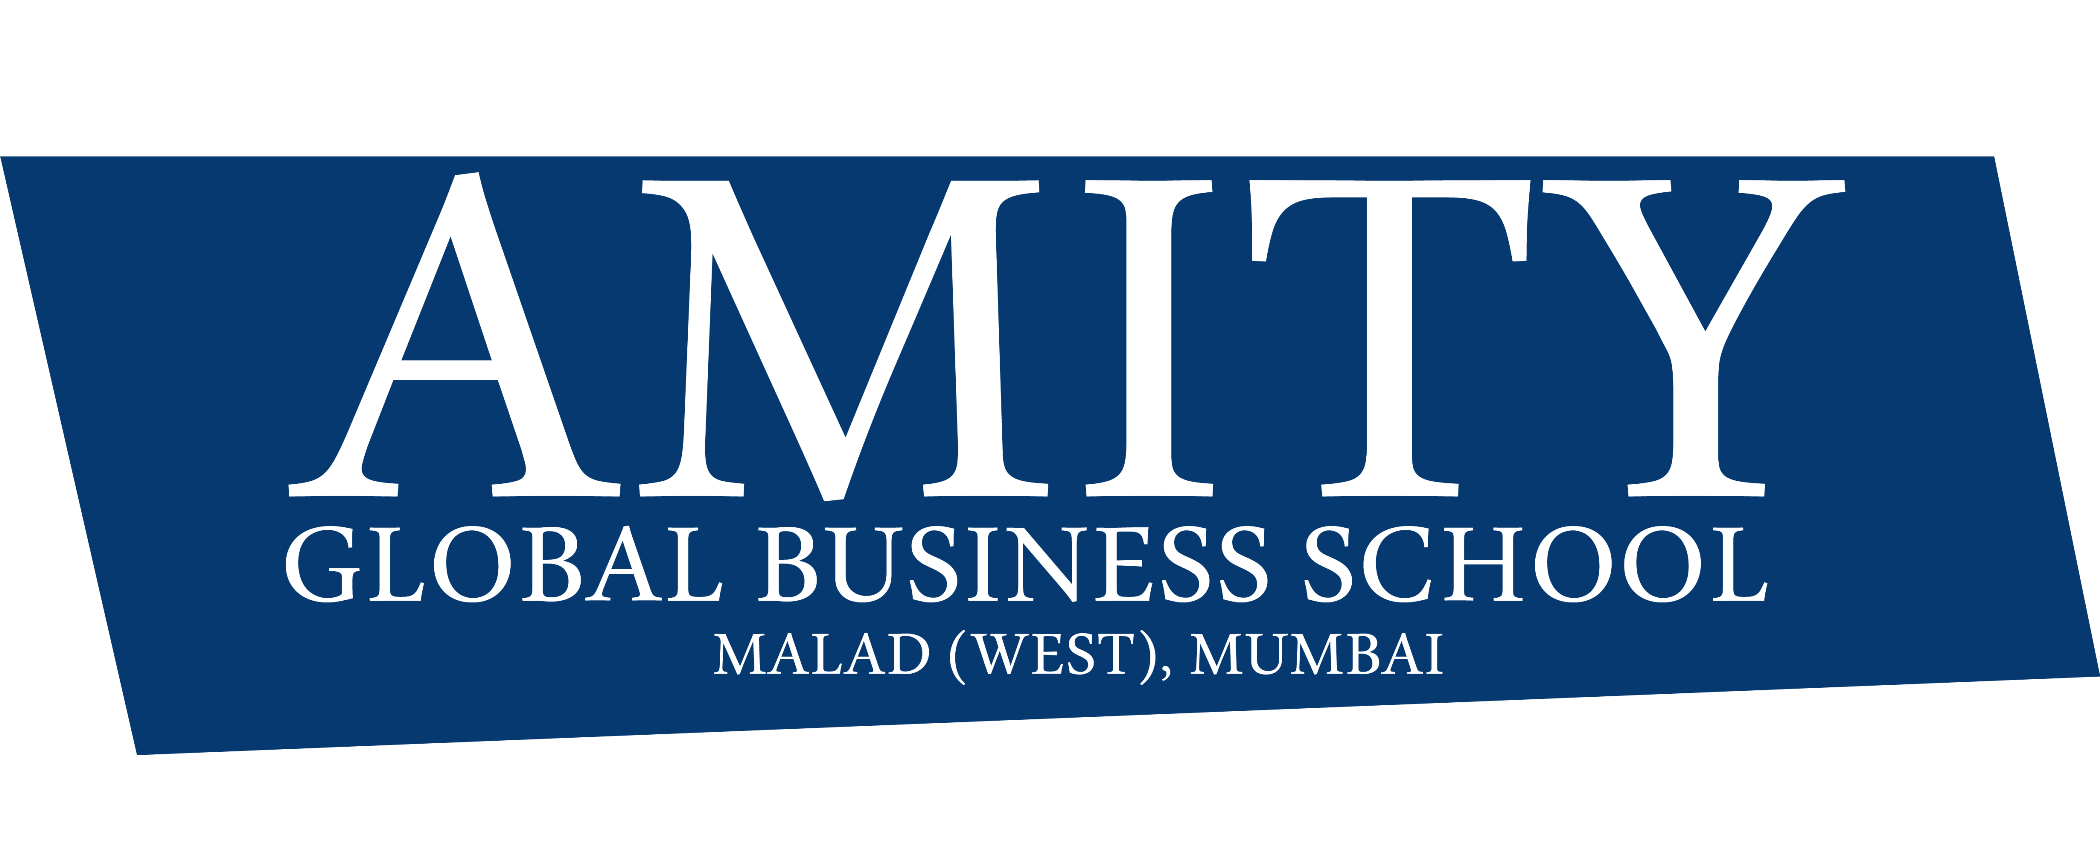 Altair Business School - Mumbai Image